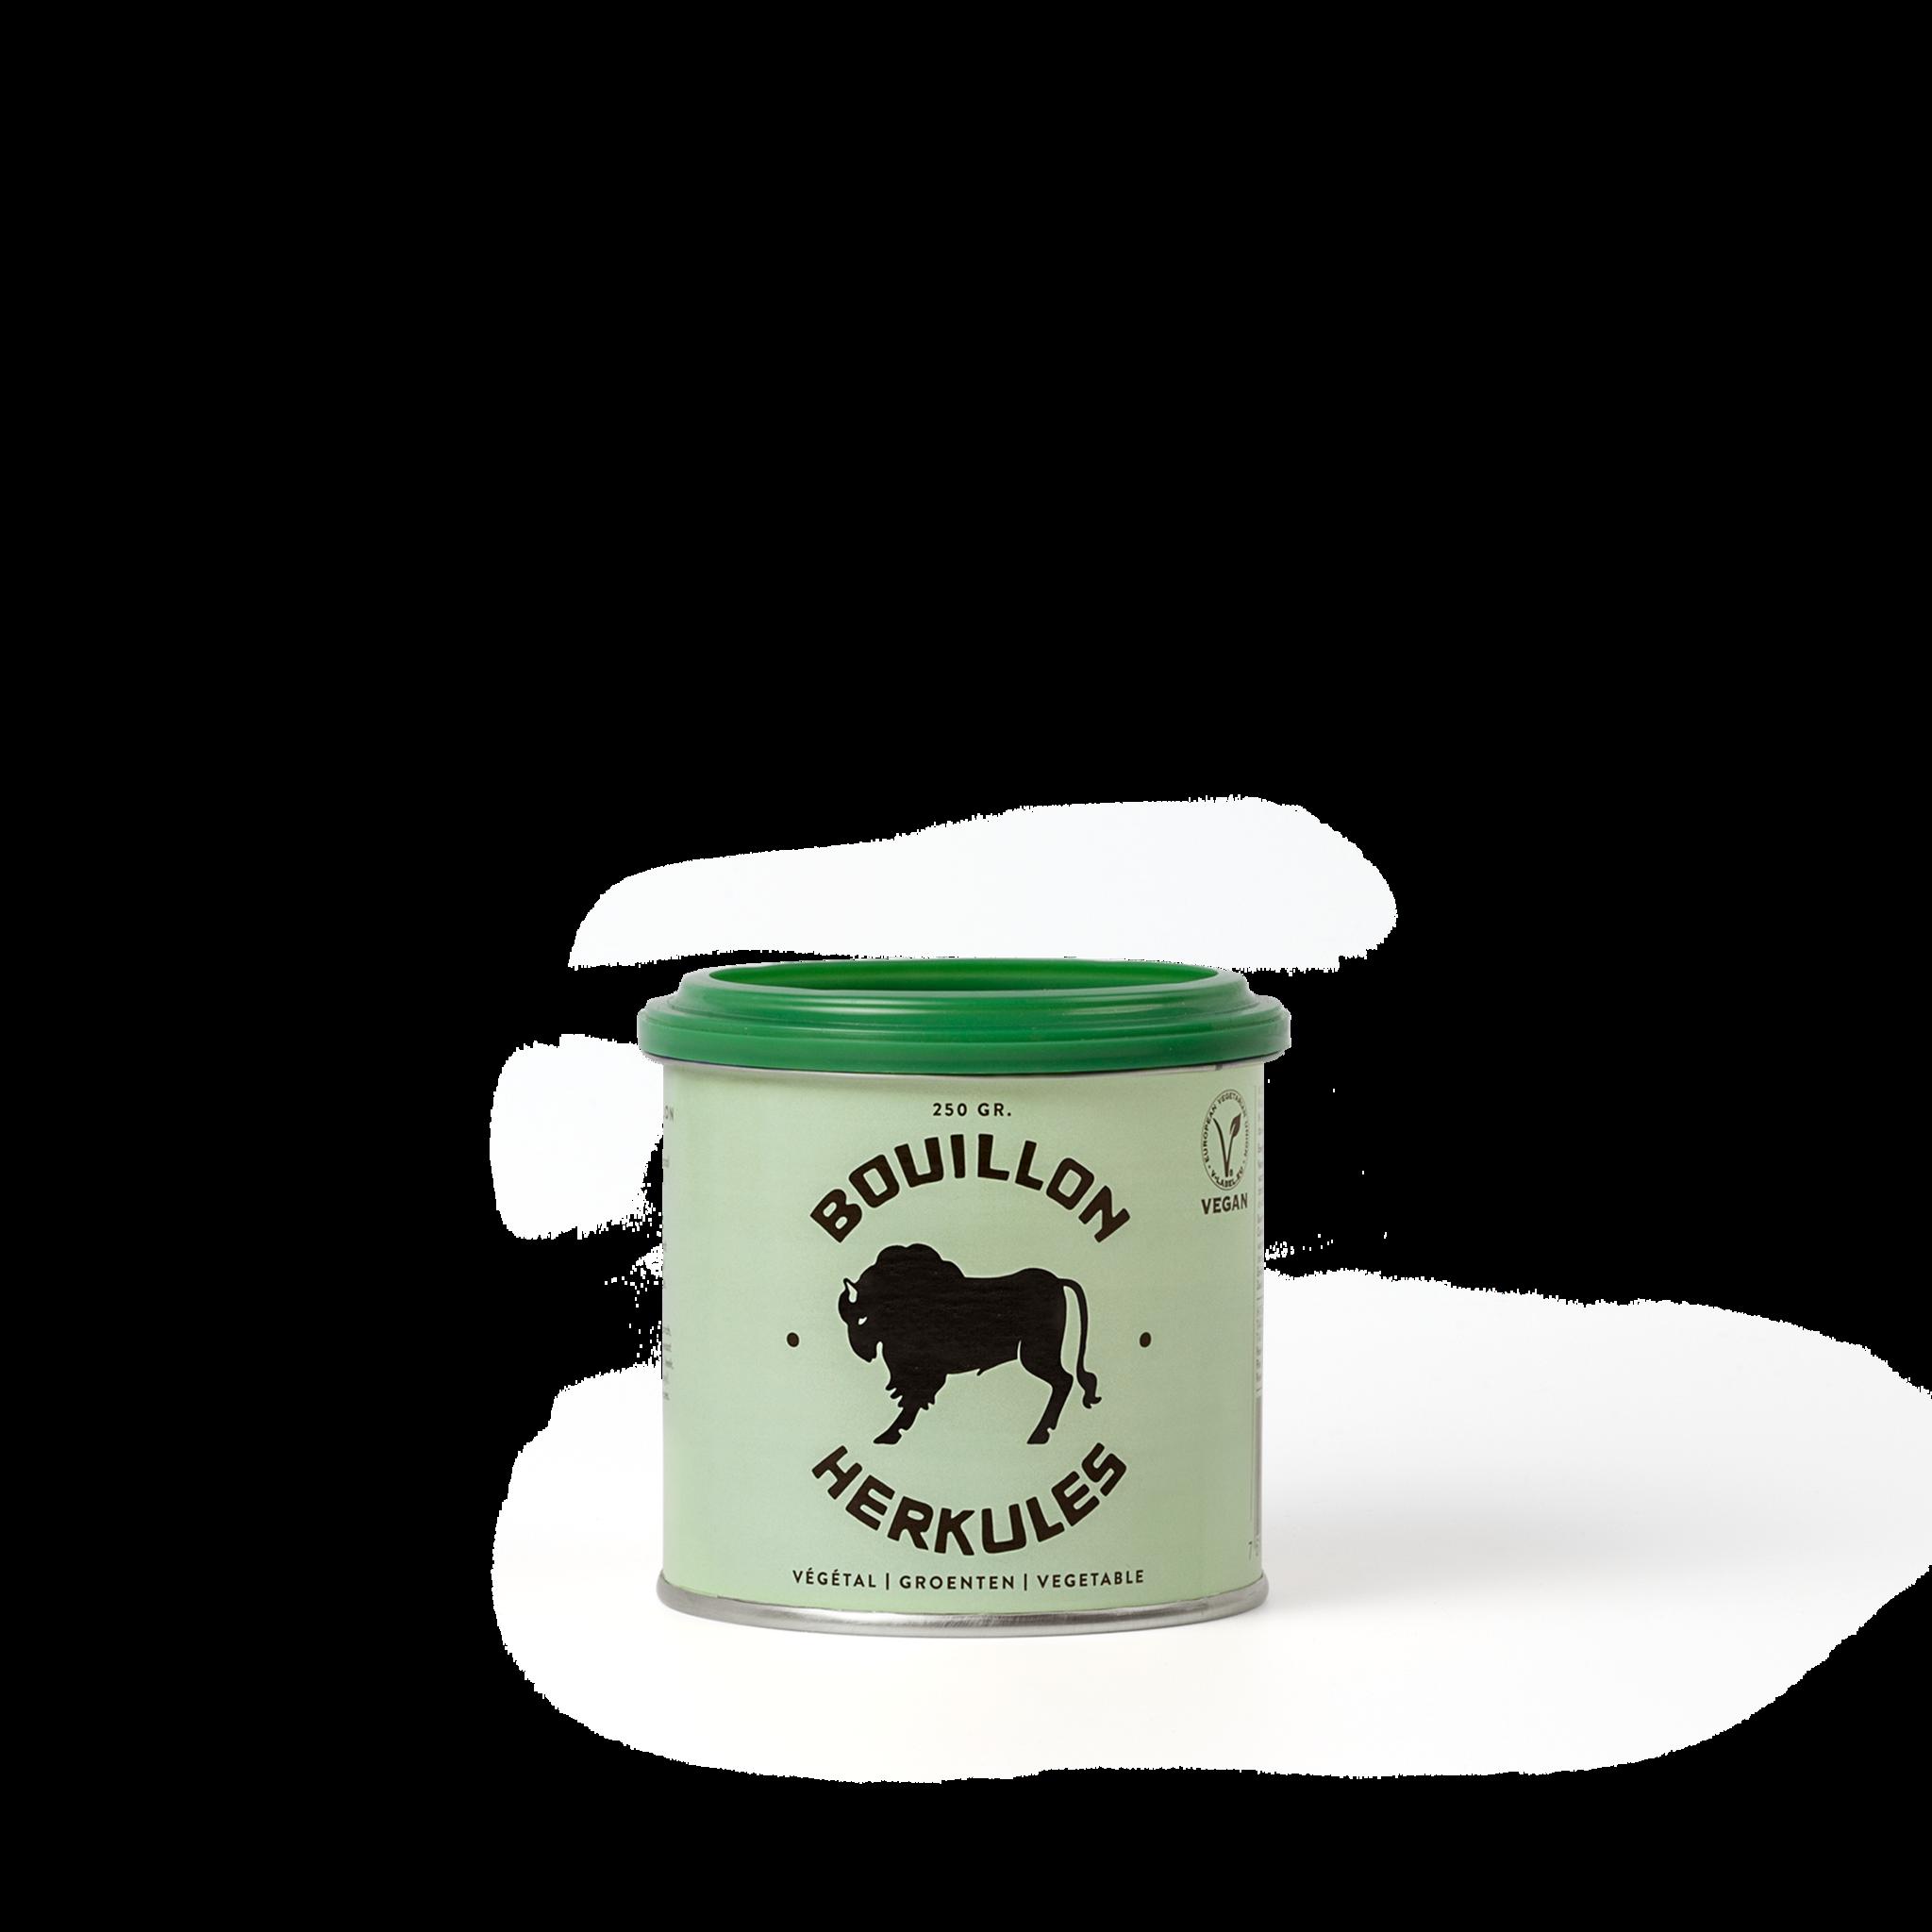 bouillon-herkules-groentenbouillon